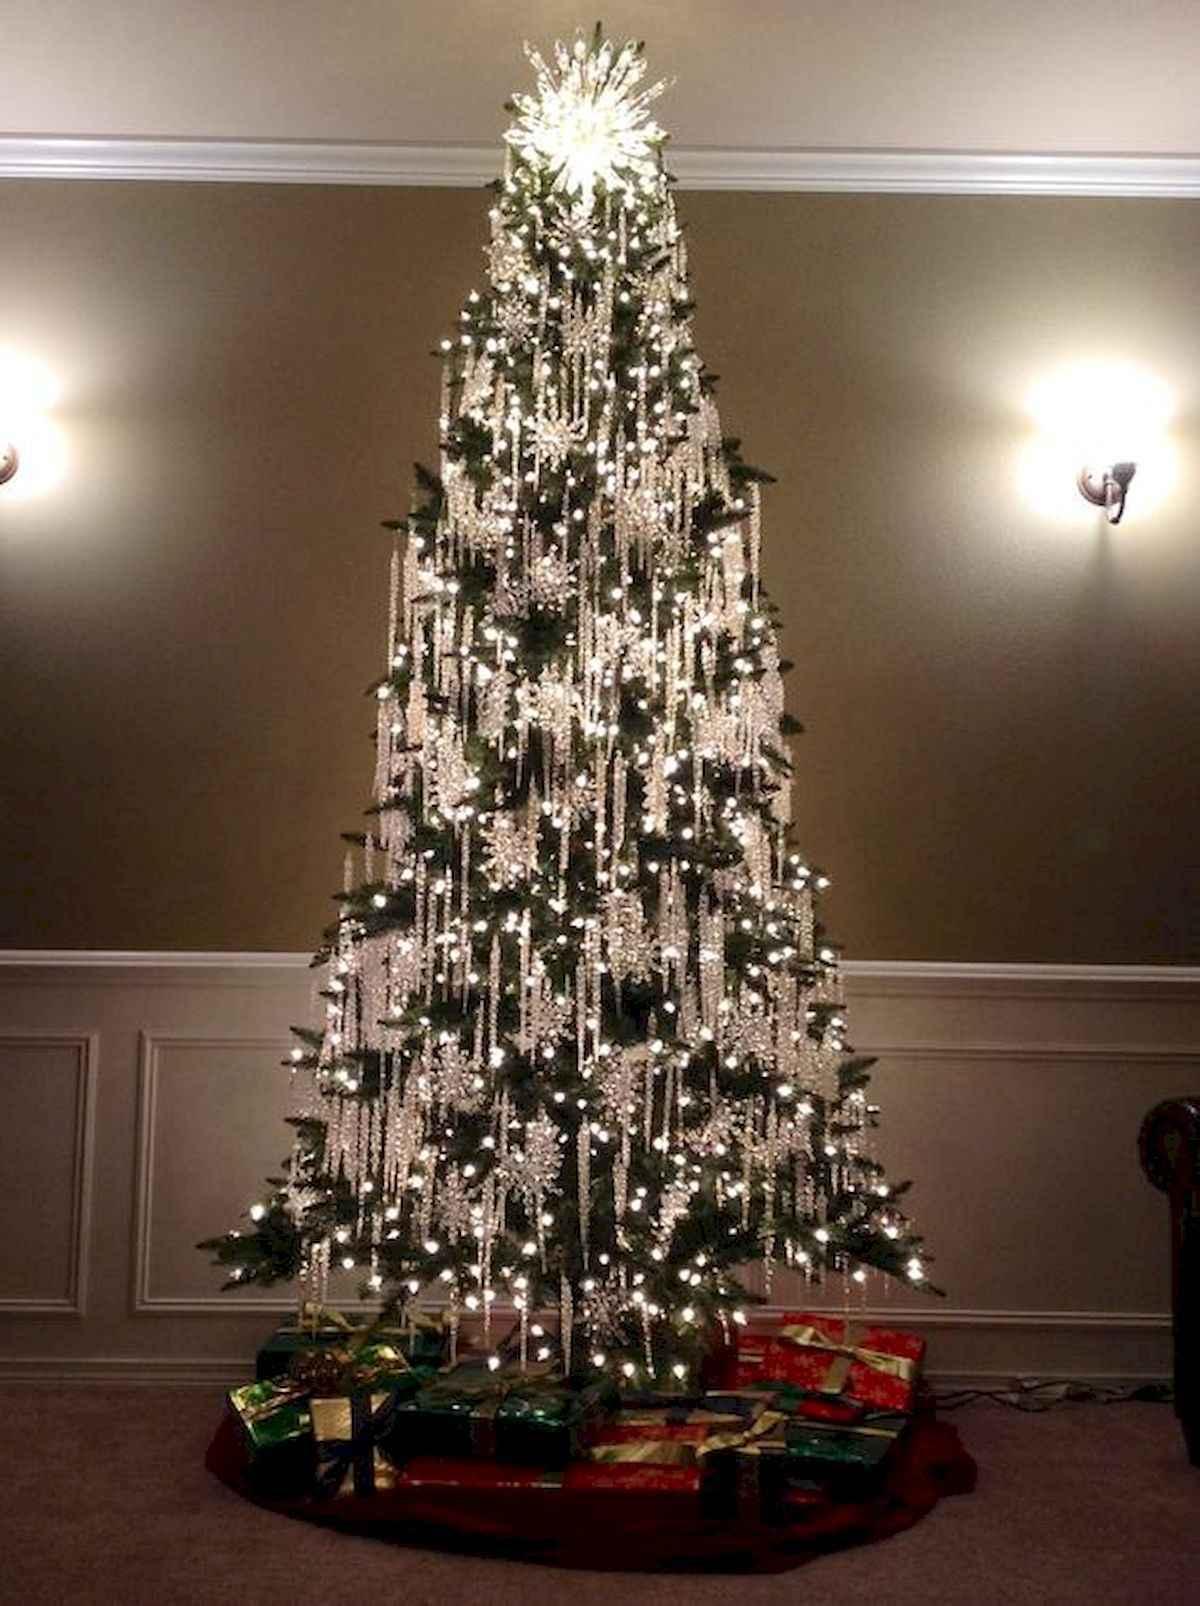 40 unique christmas tree ideas decorations (34)